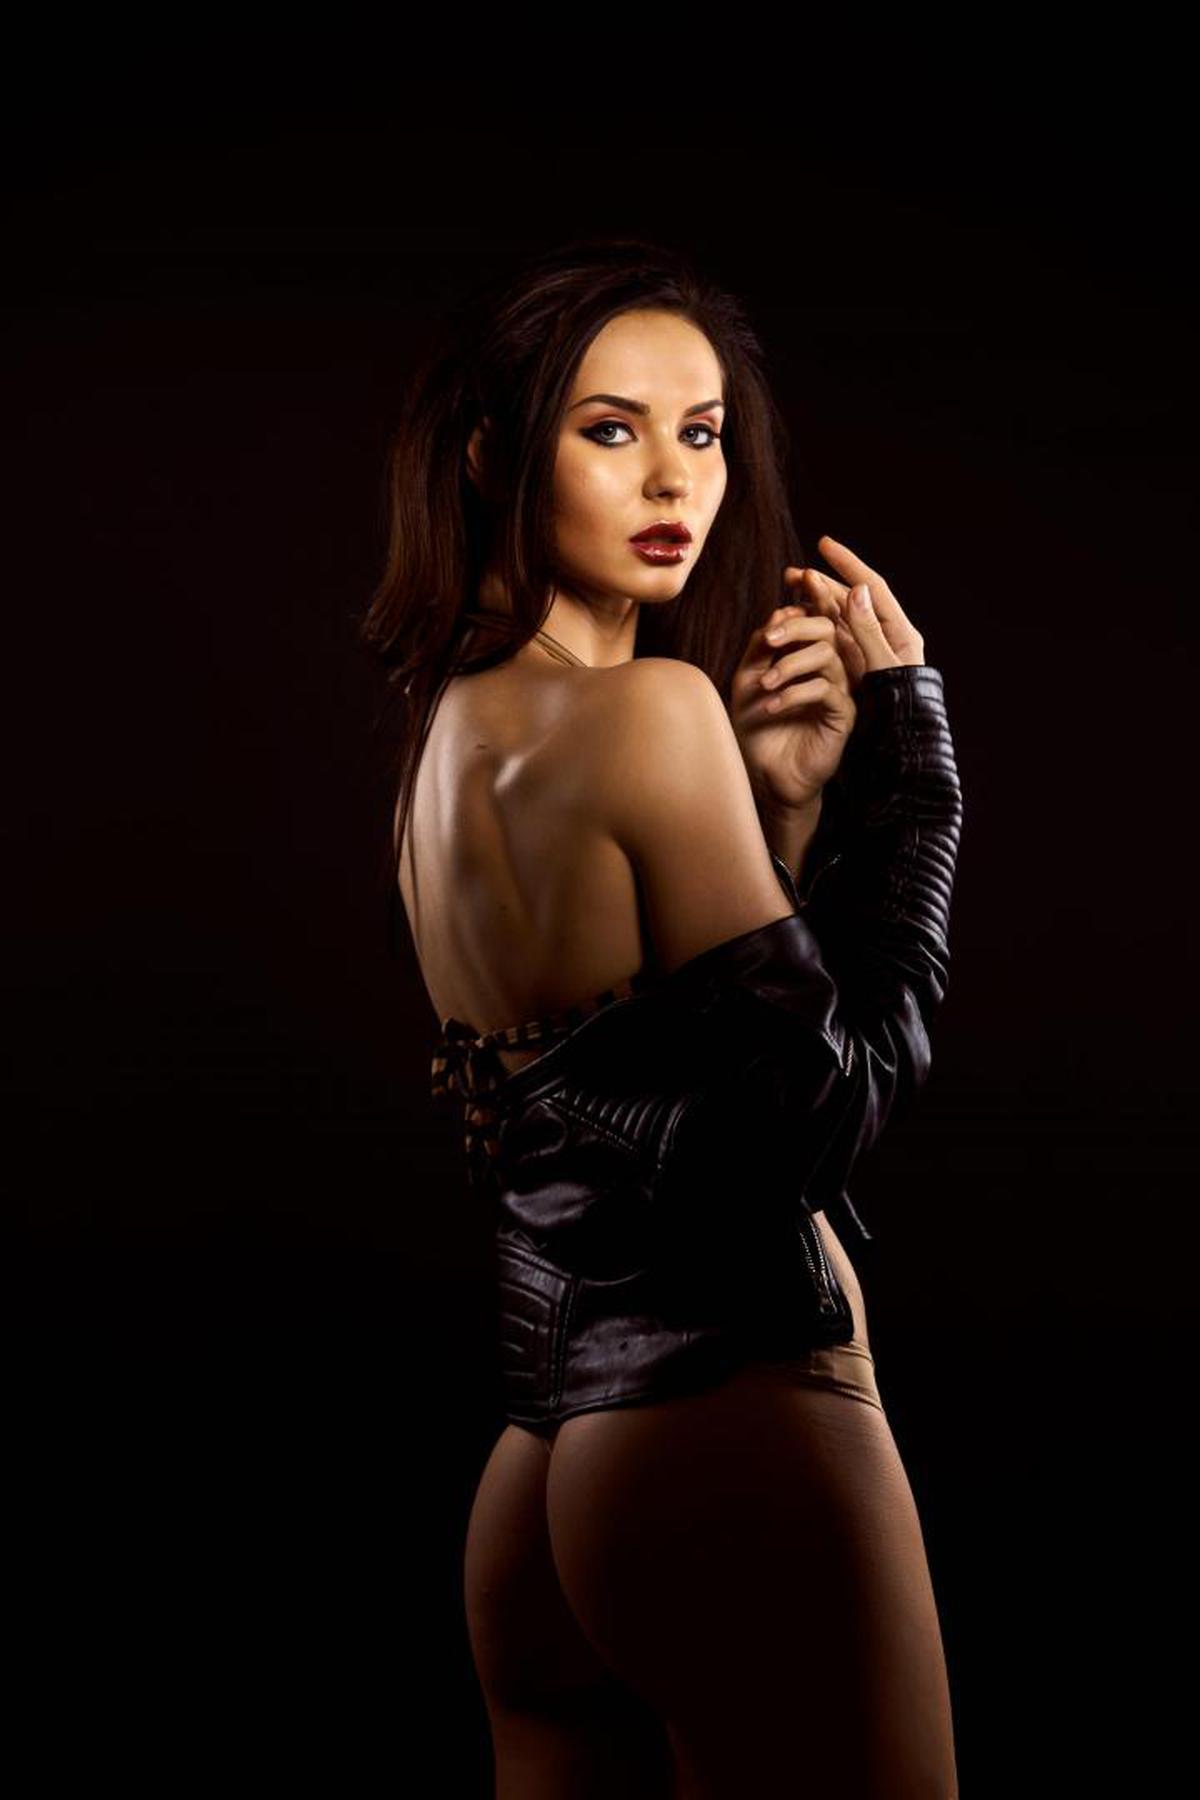 Image of Beauty, Model, Lady, Photo shoot etc.